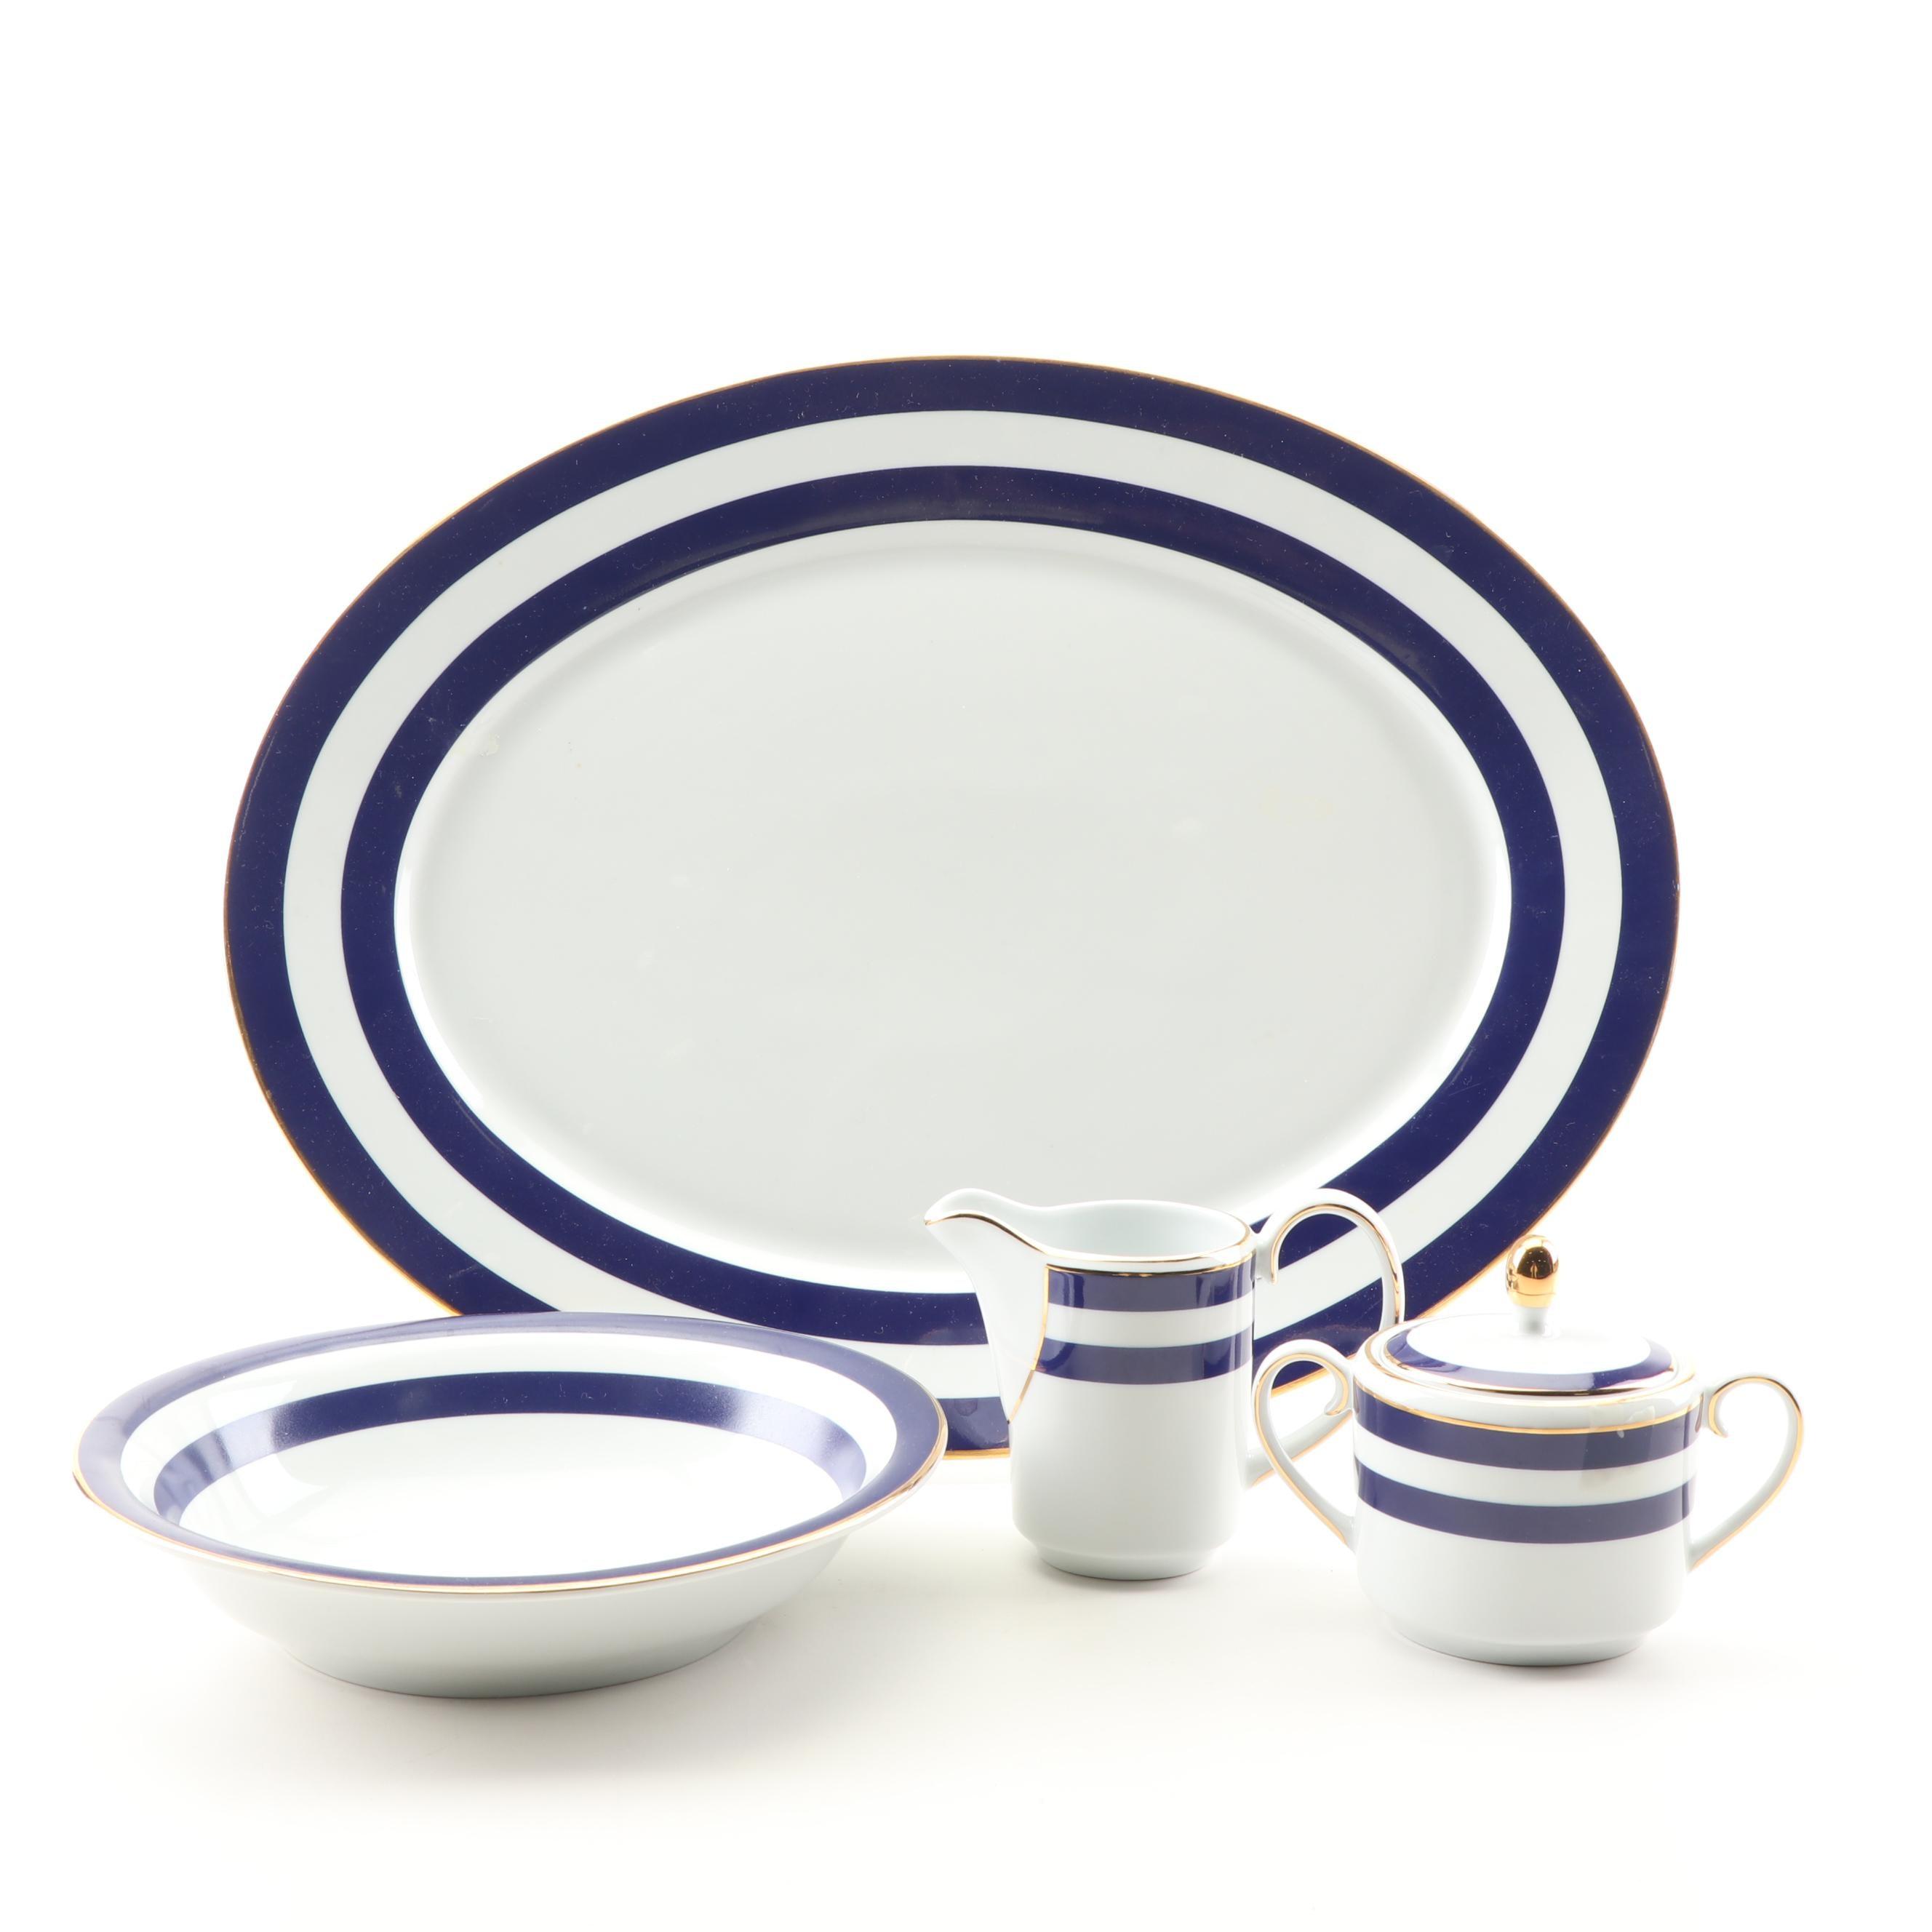 "Ralph Lauren ""Spectator Cadet"" Ceramic Serveware Set"